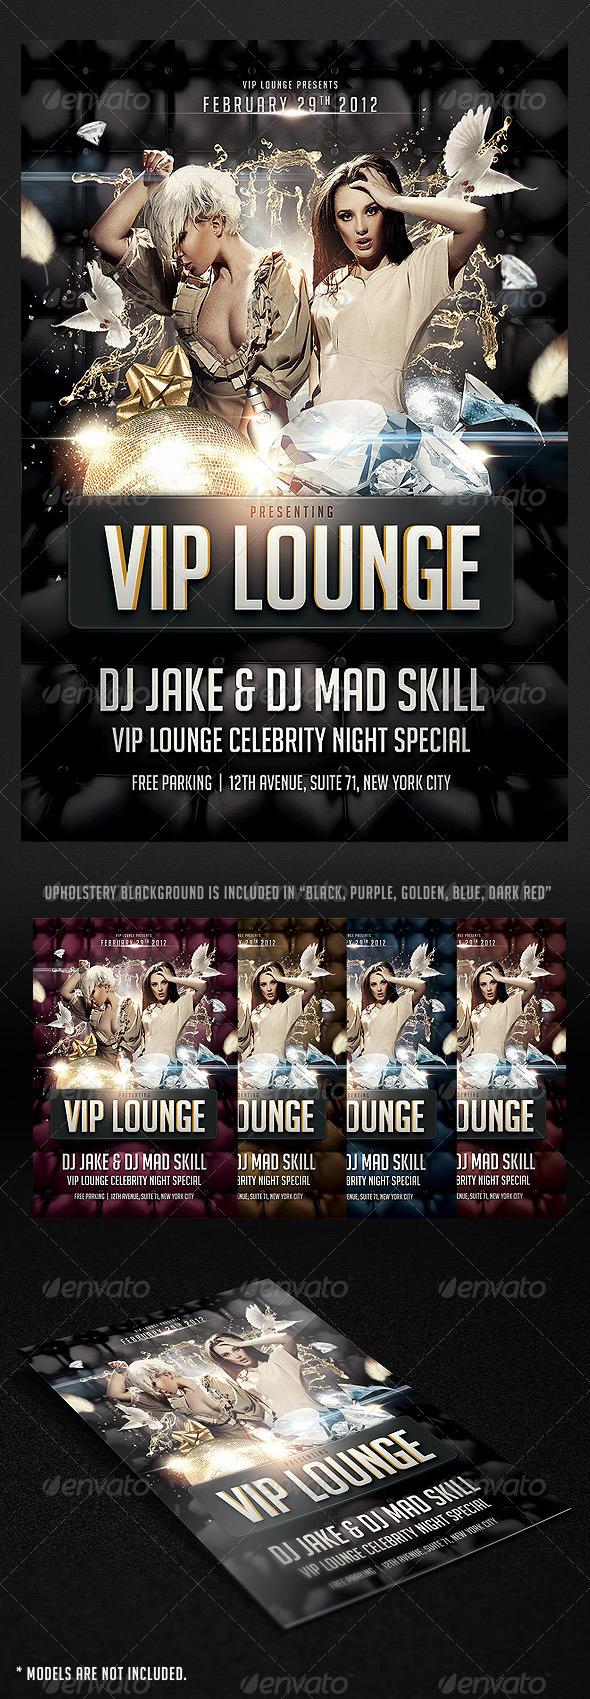 GraphicRiver VIP Lounge Flyer 1679940